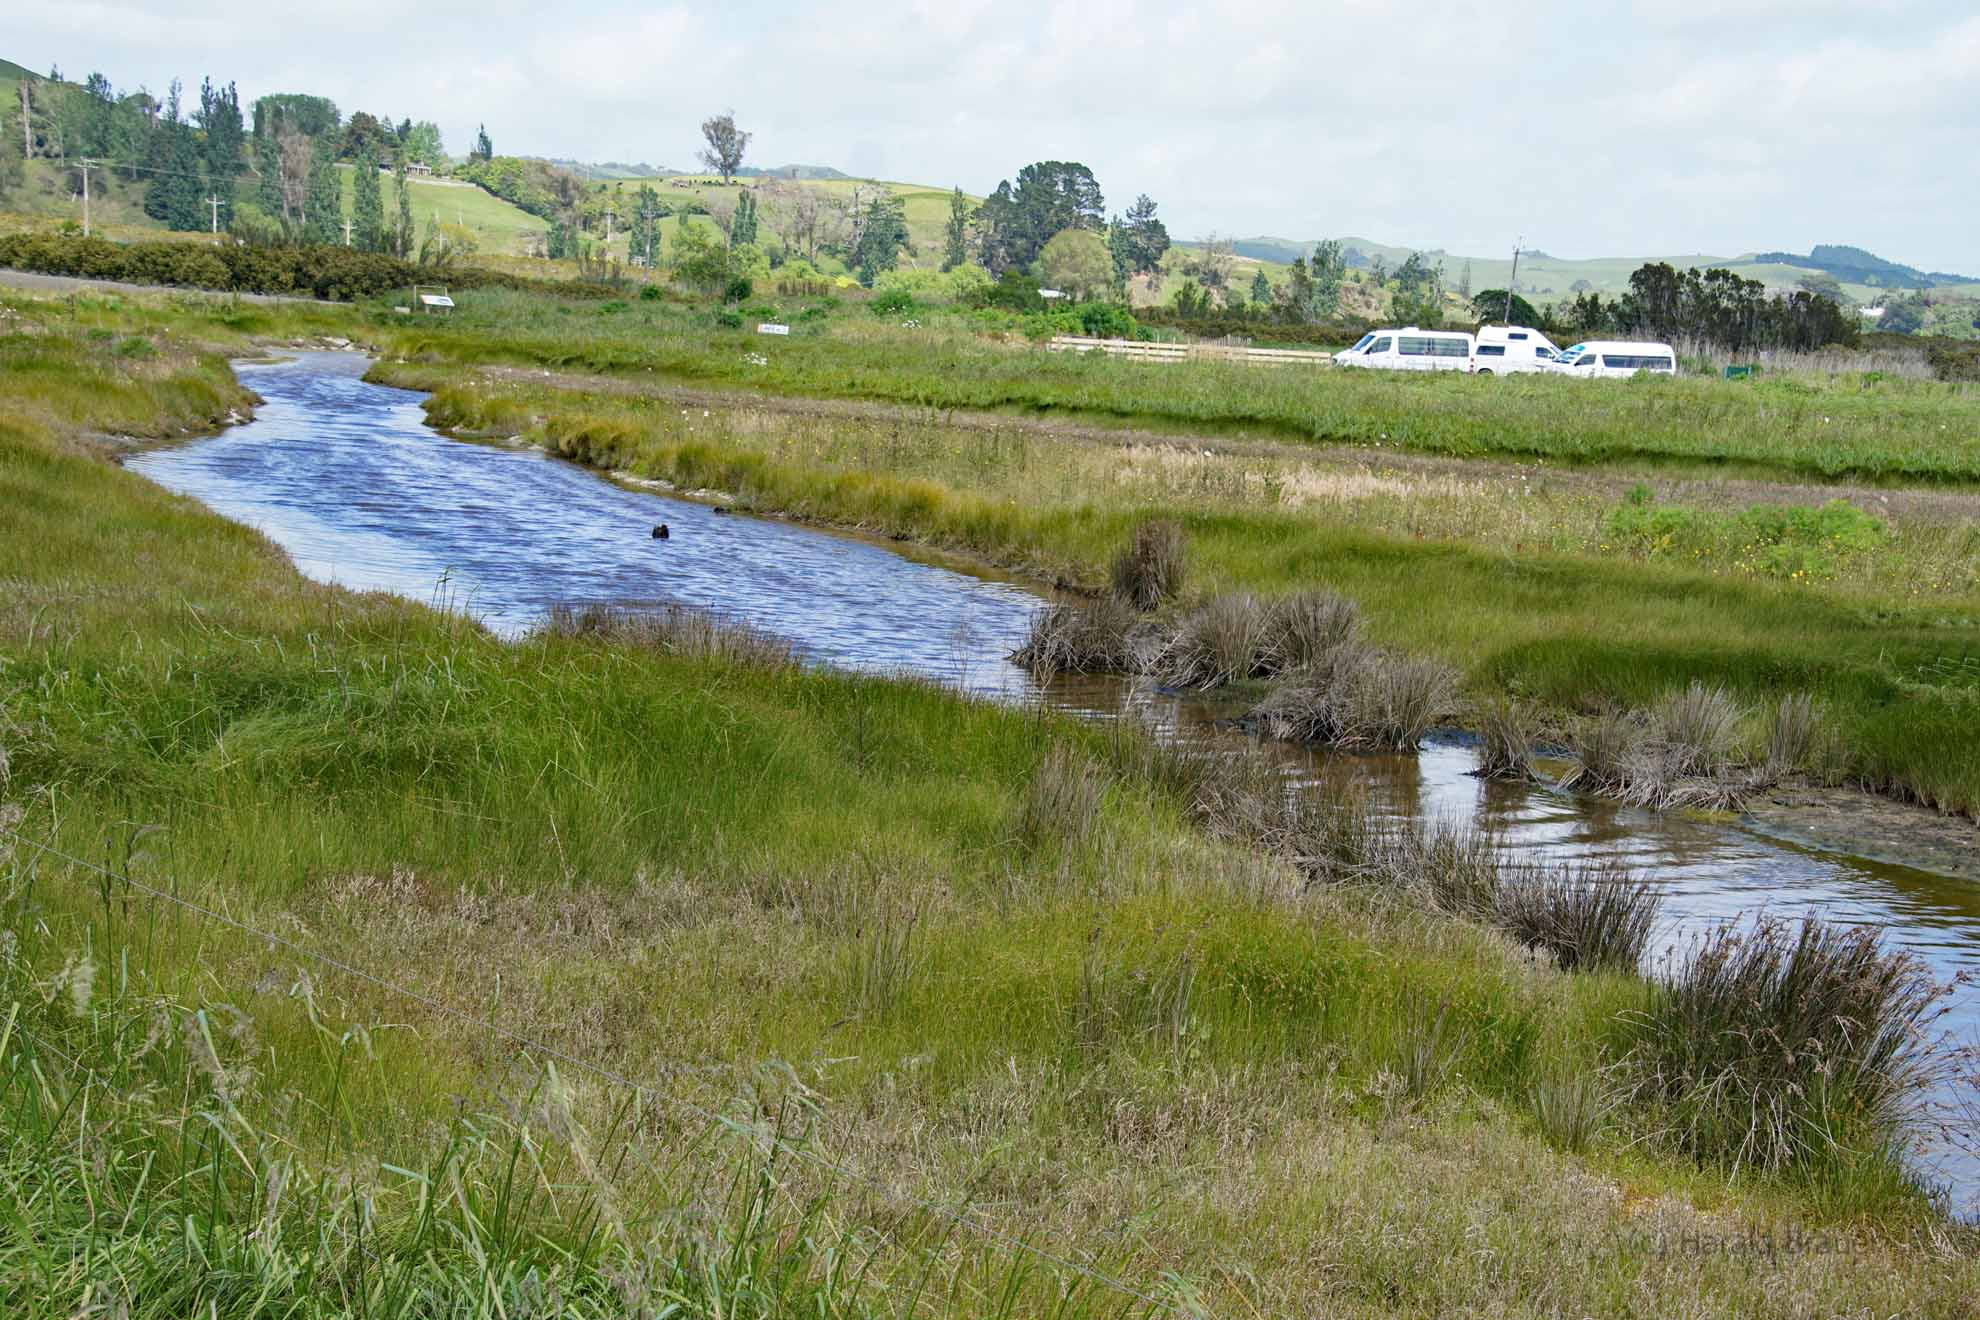 Moor, Gräben im Naturschutzgebiet